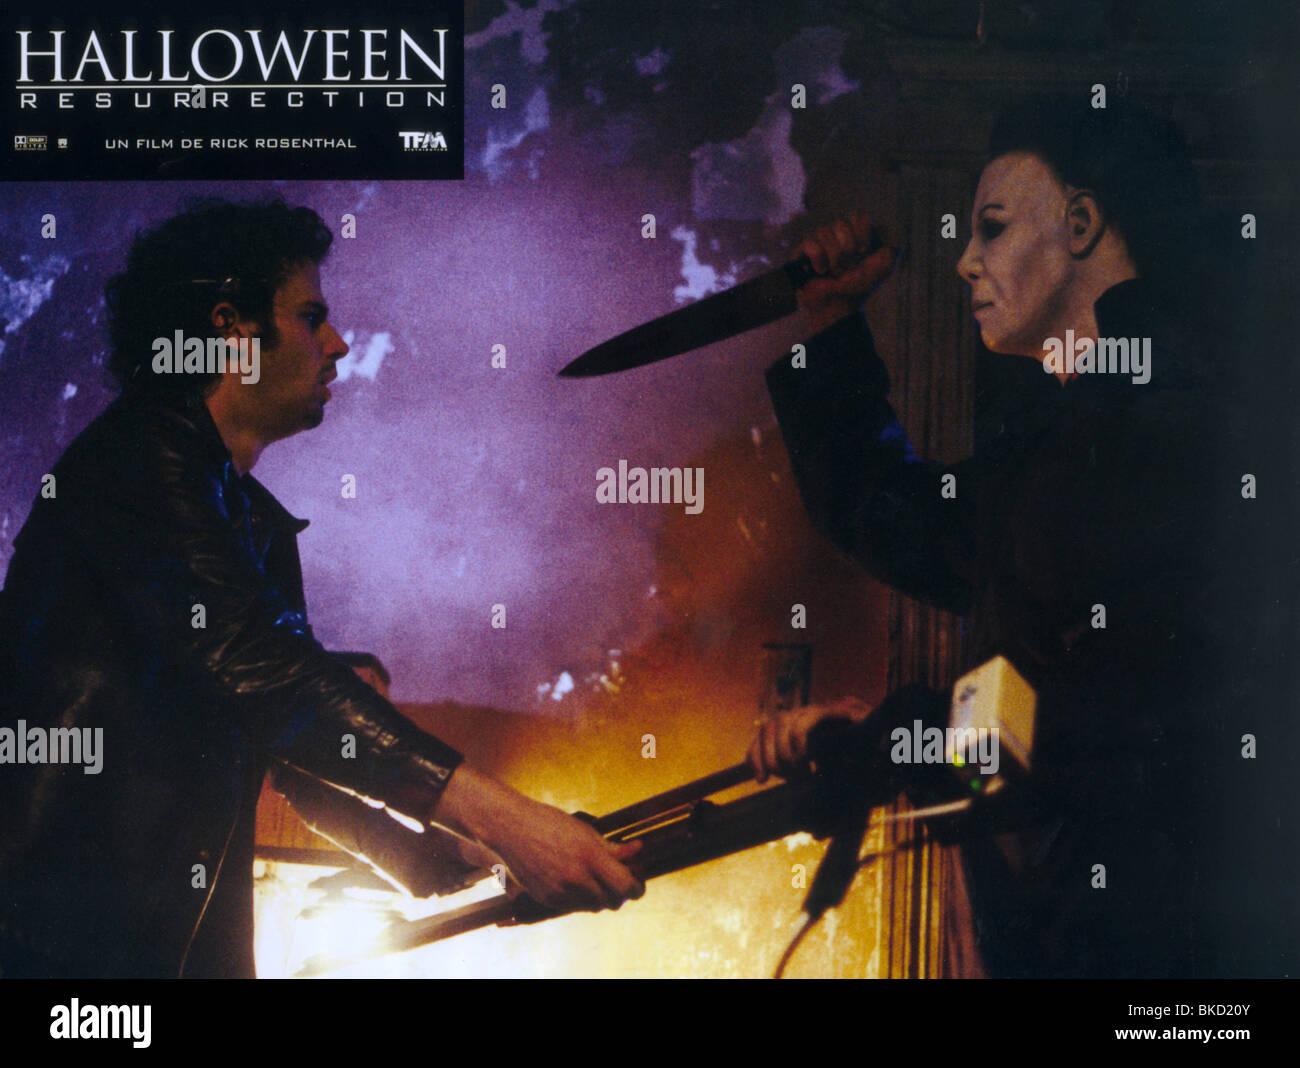 halloween: resurrection (2002) halloween 8 (alt) h2k (alt) brad